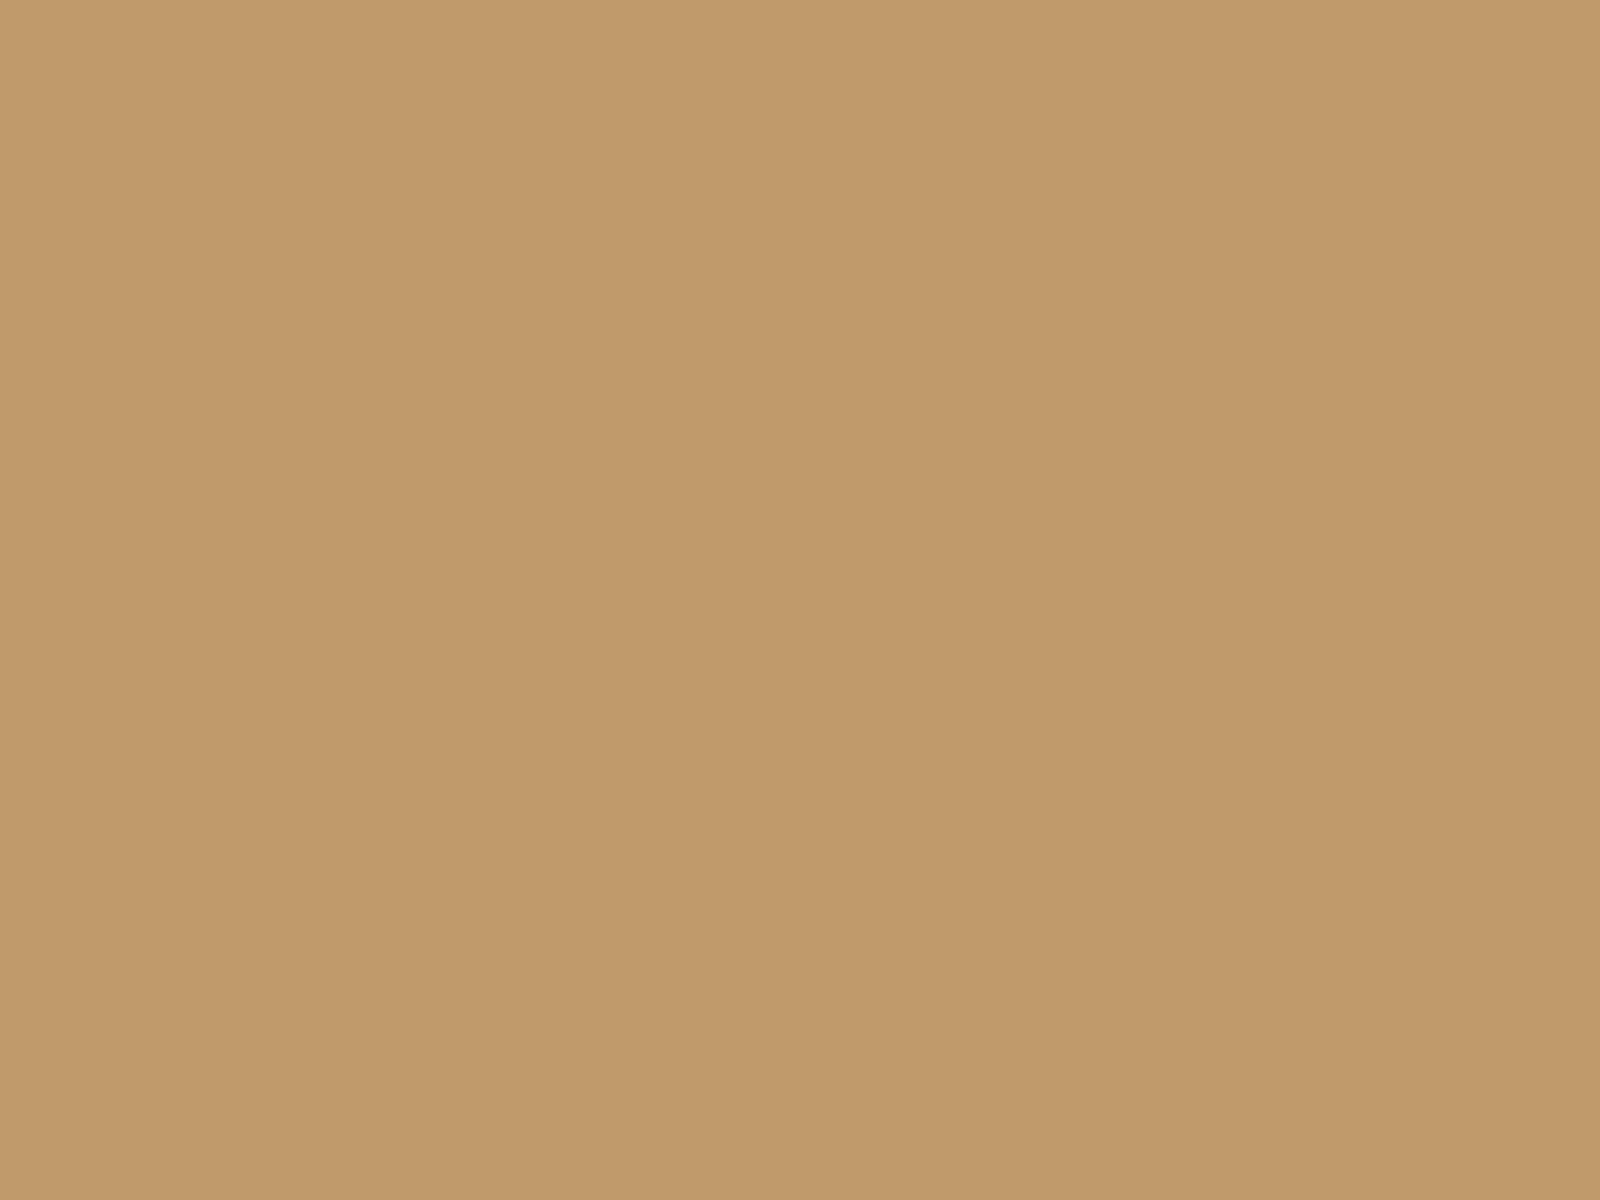 1600x1200 Desert Solid Color Background